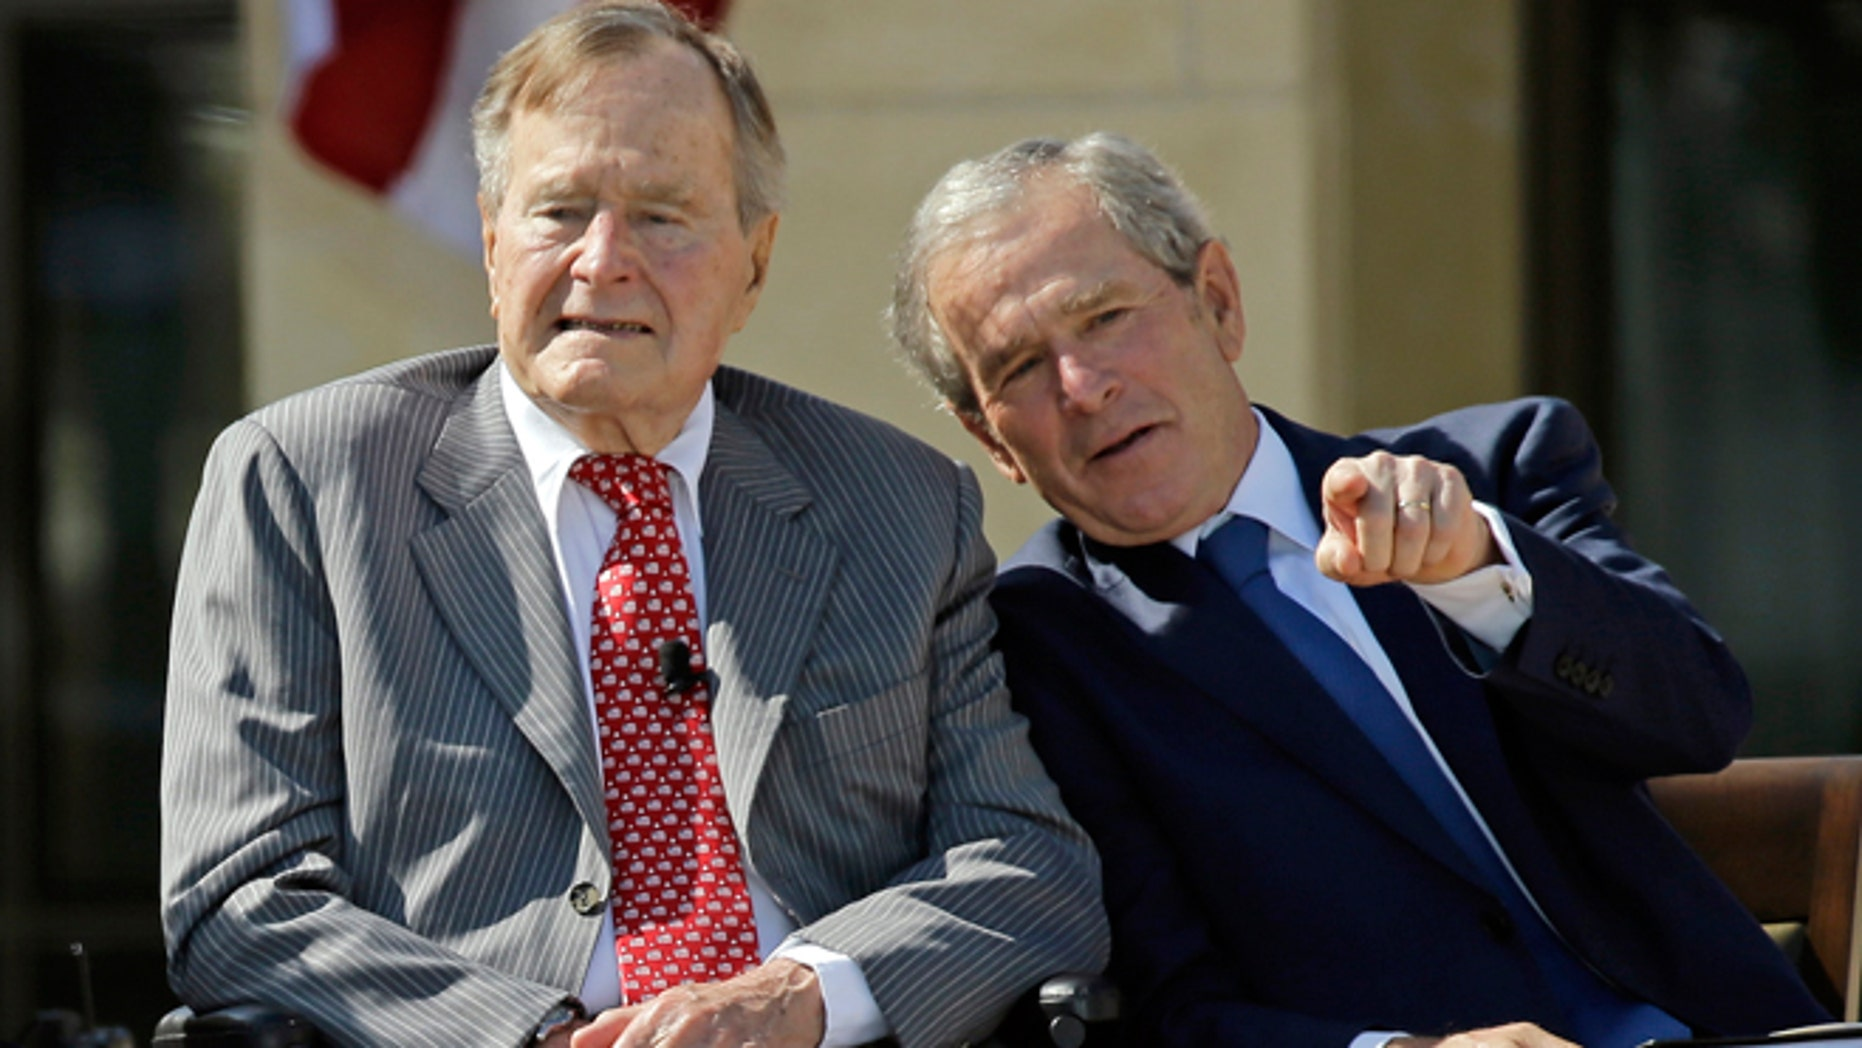 April 25, 2013: Former President George W. Bush talks with his father, former President George H. W. Bush, left, during the dedication of the George W. Bush Presidential Center in Dallas.